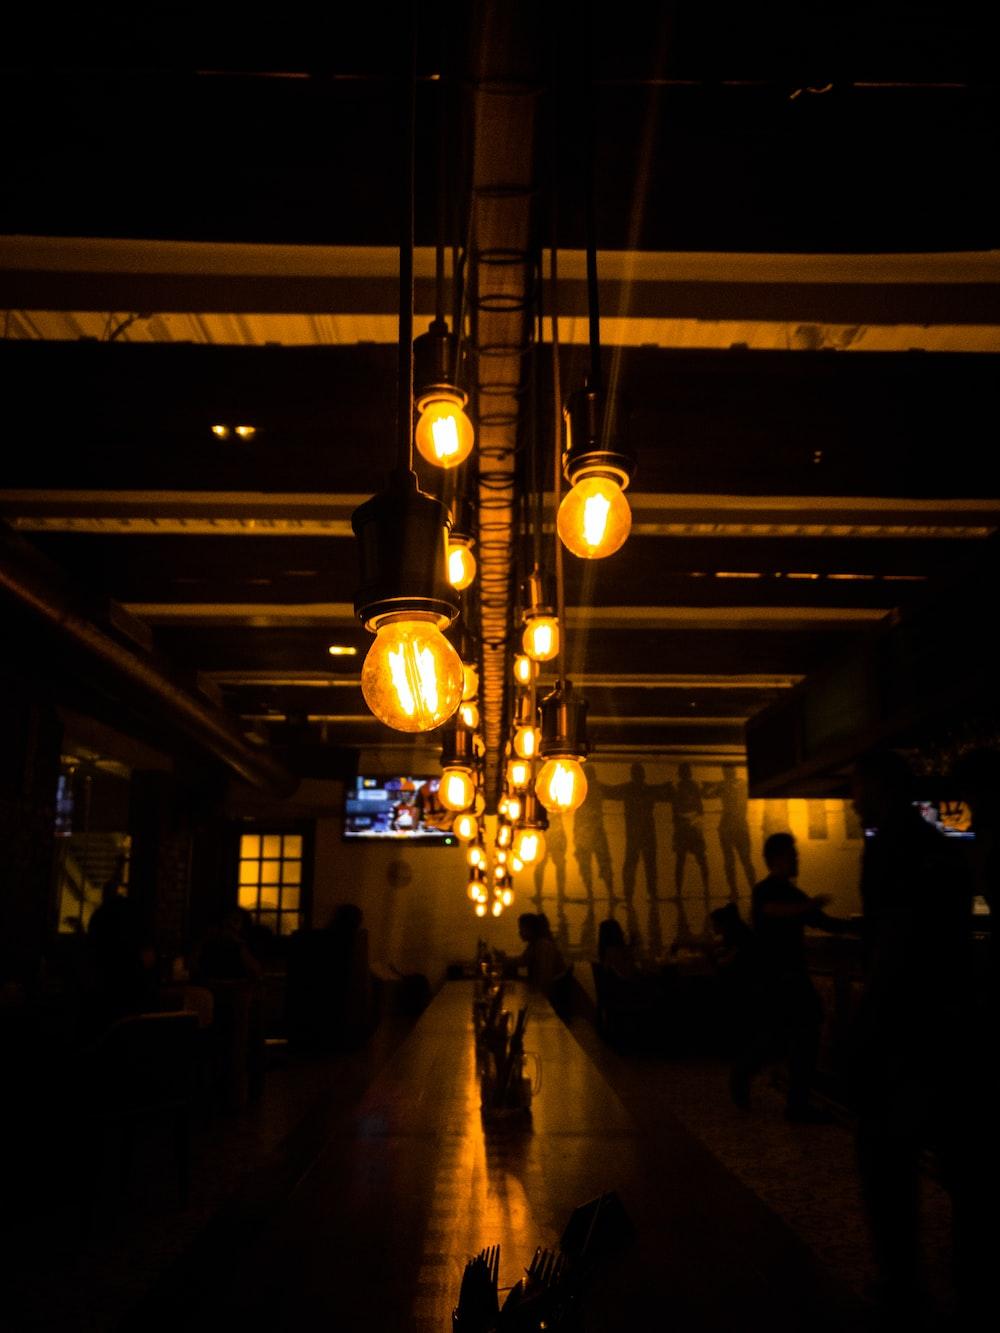 Black String Lights On Dark Room Photo Free Lighting Image